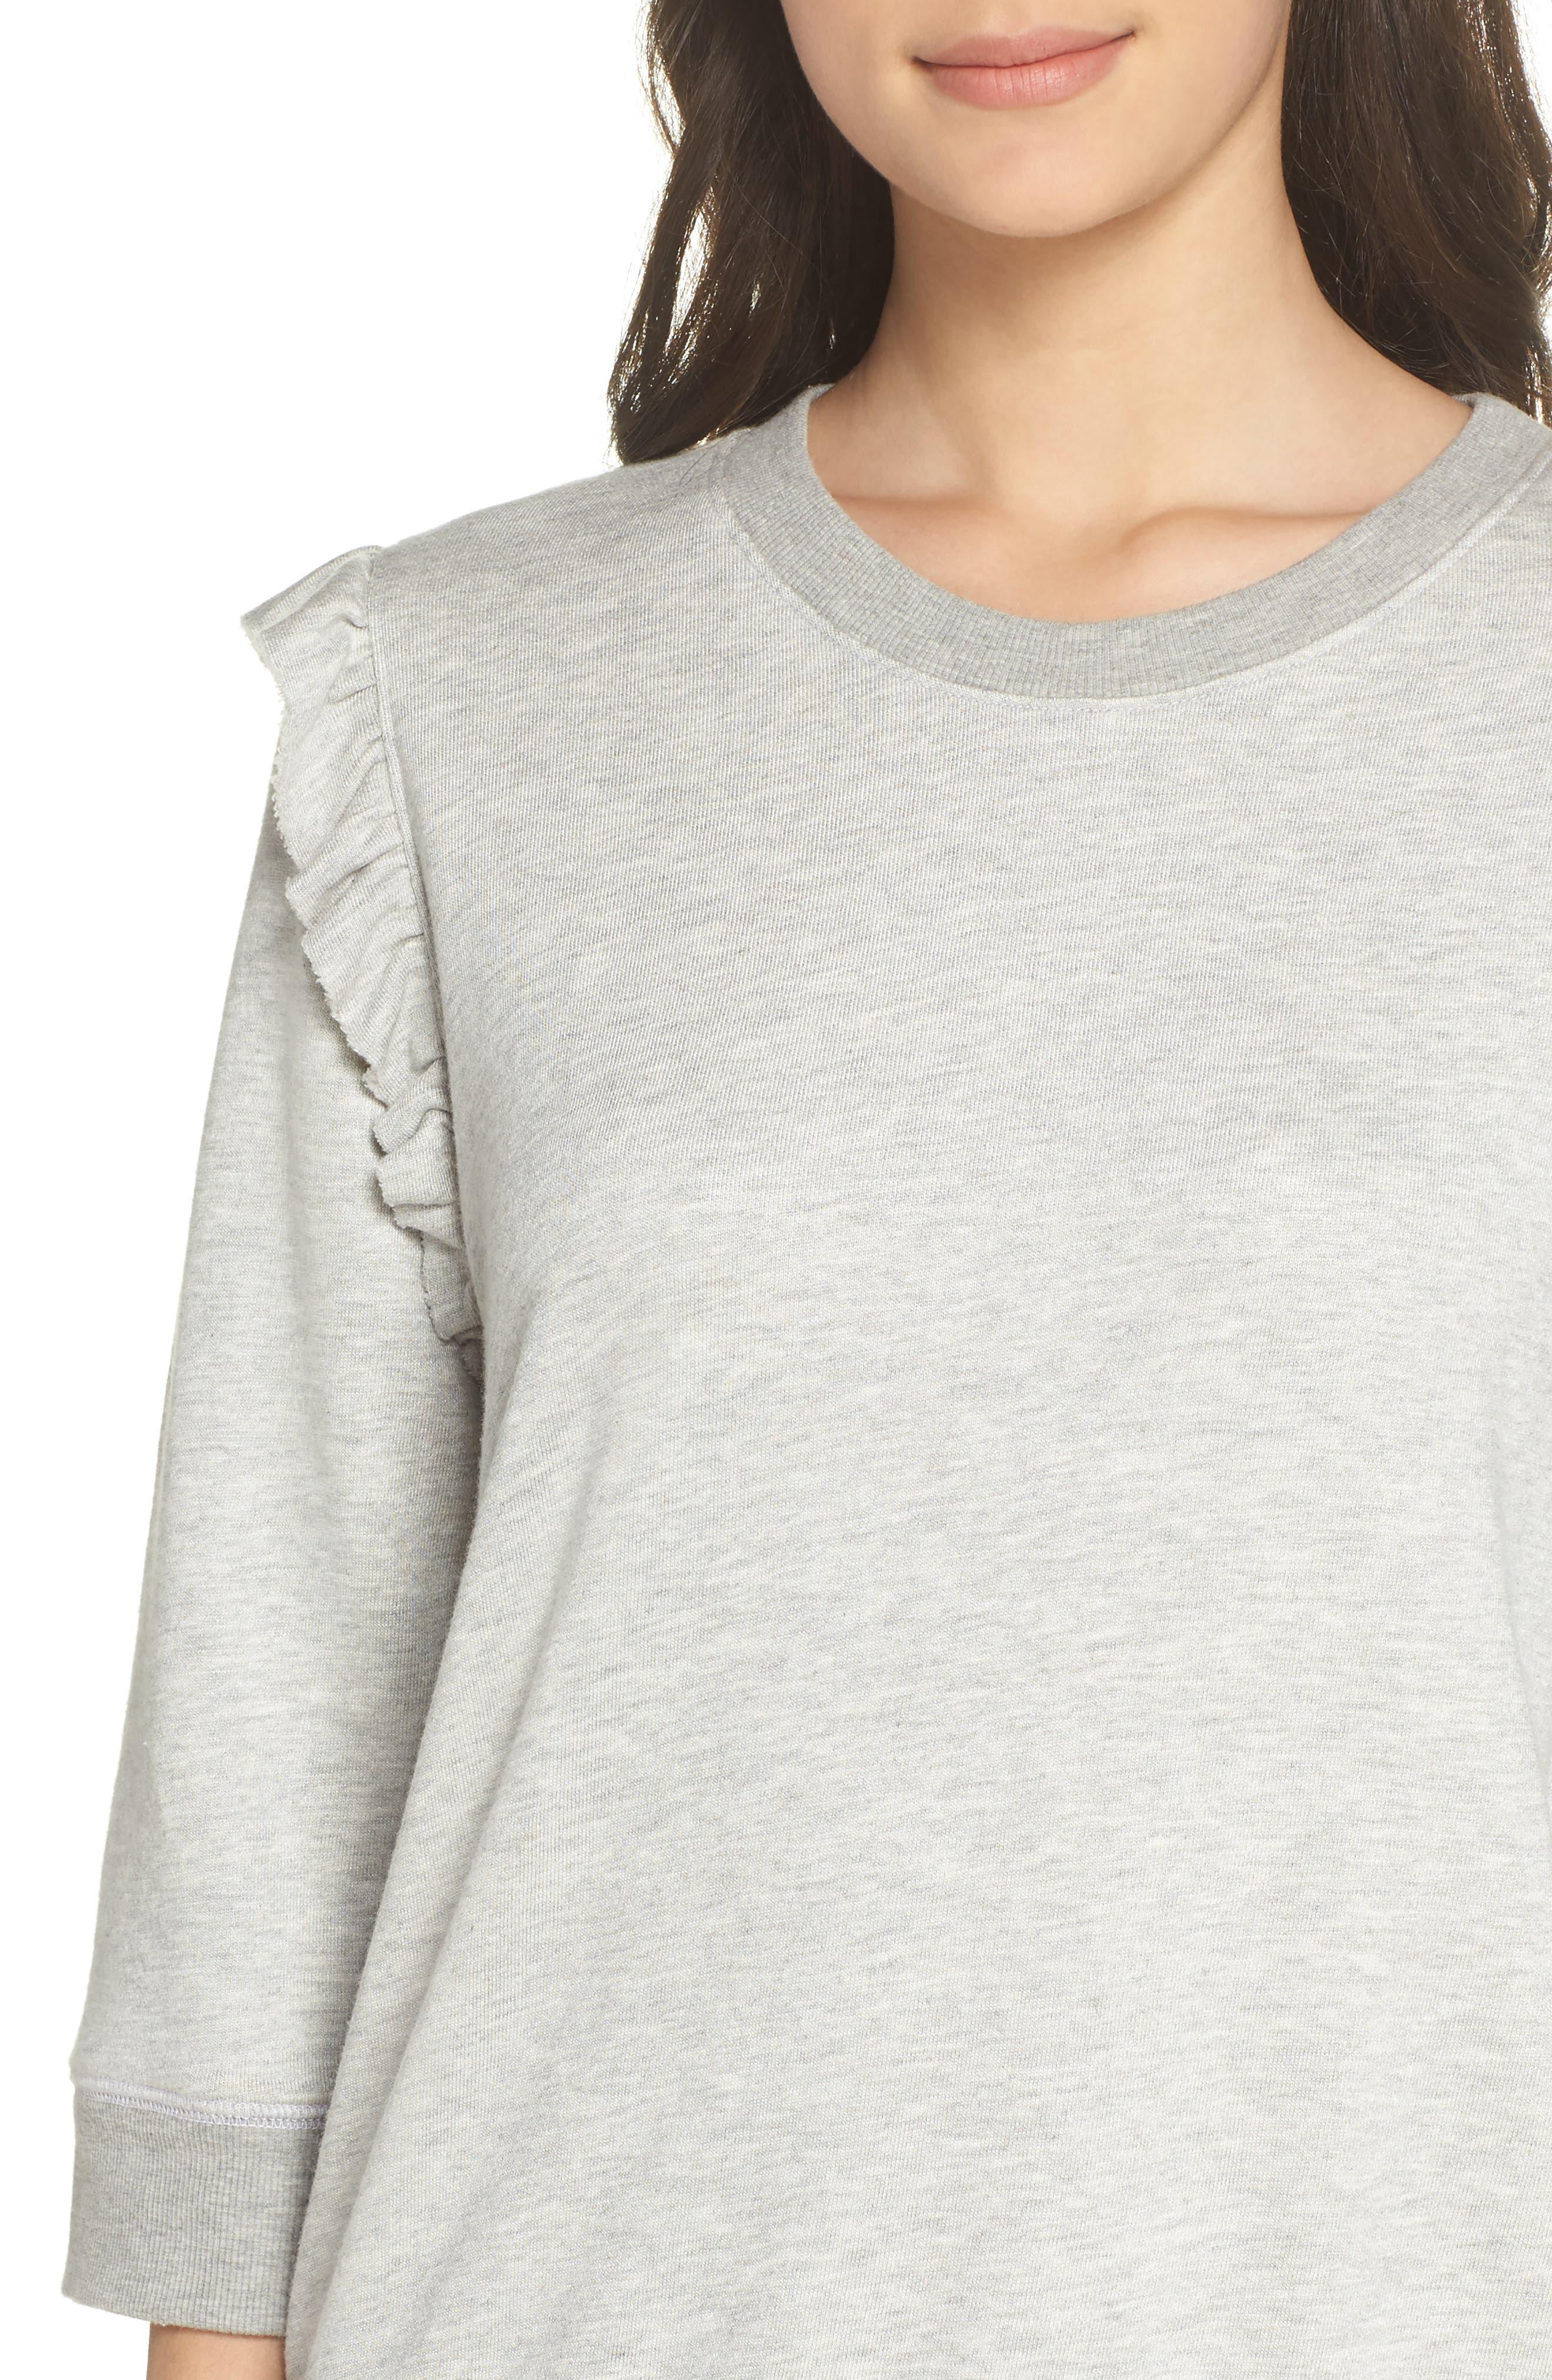 Ruffle Sweatshirt,                             Alternate thumbnail 4, color,                             HEATHER GREY